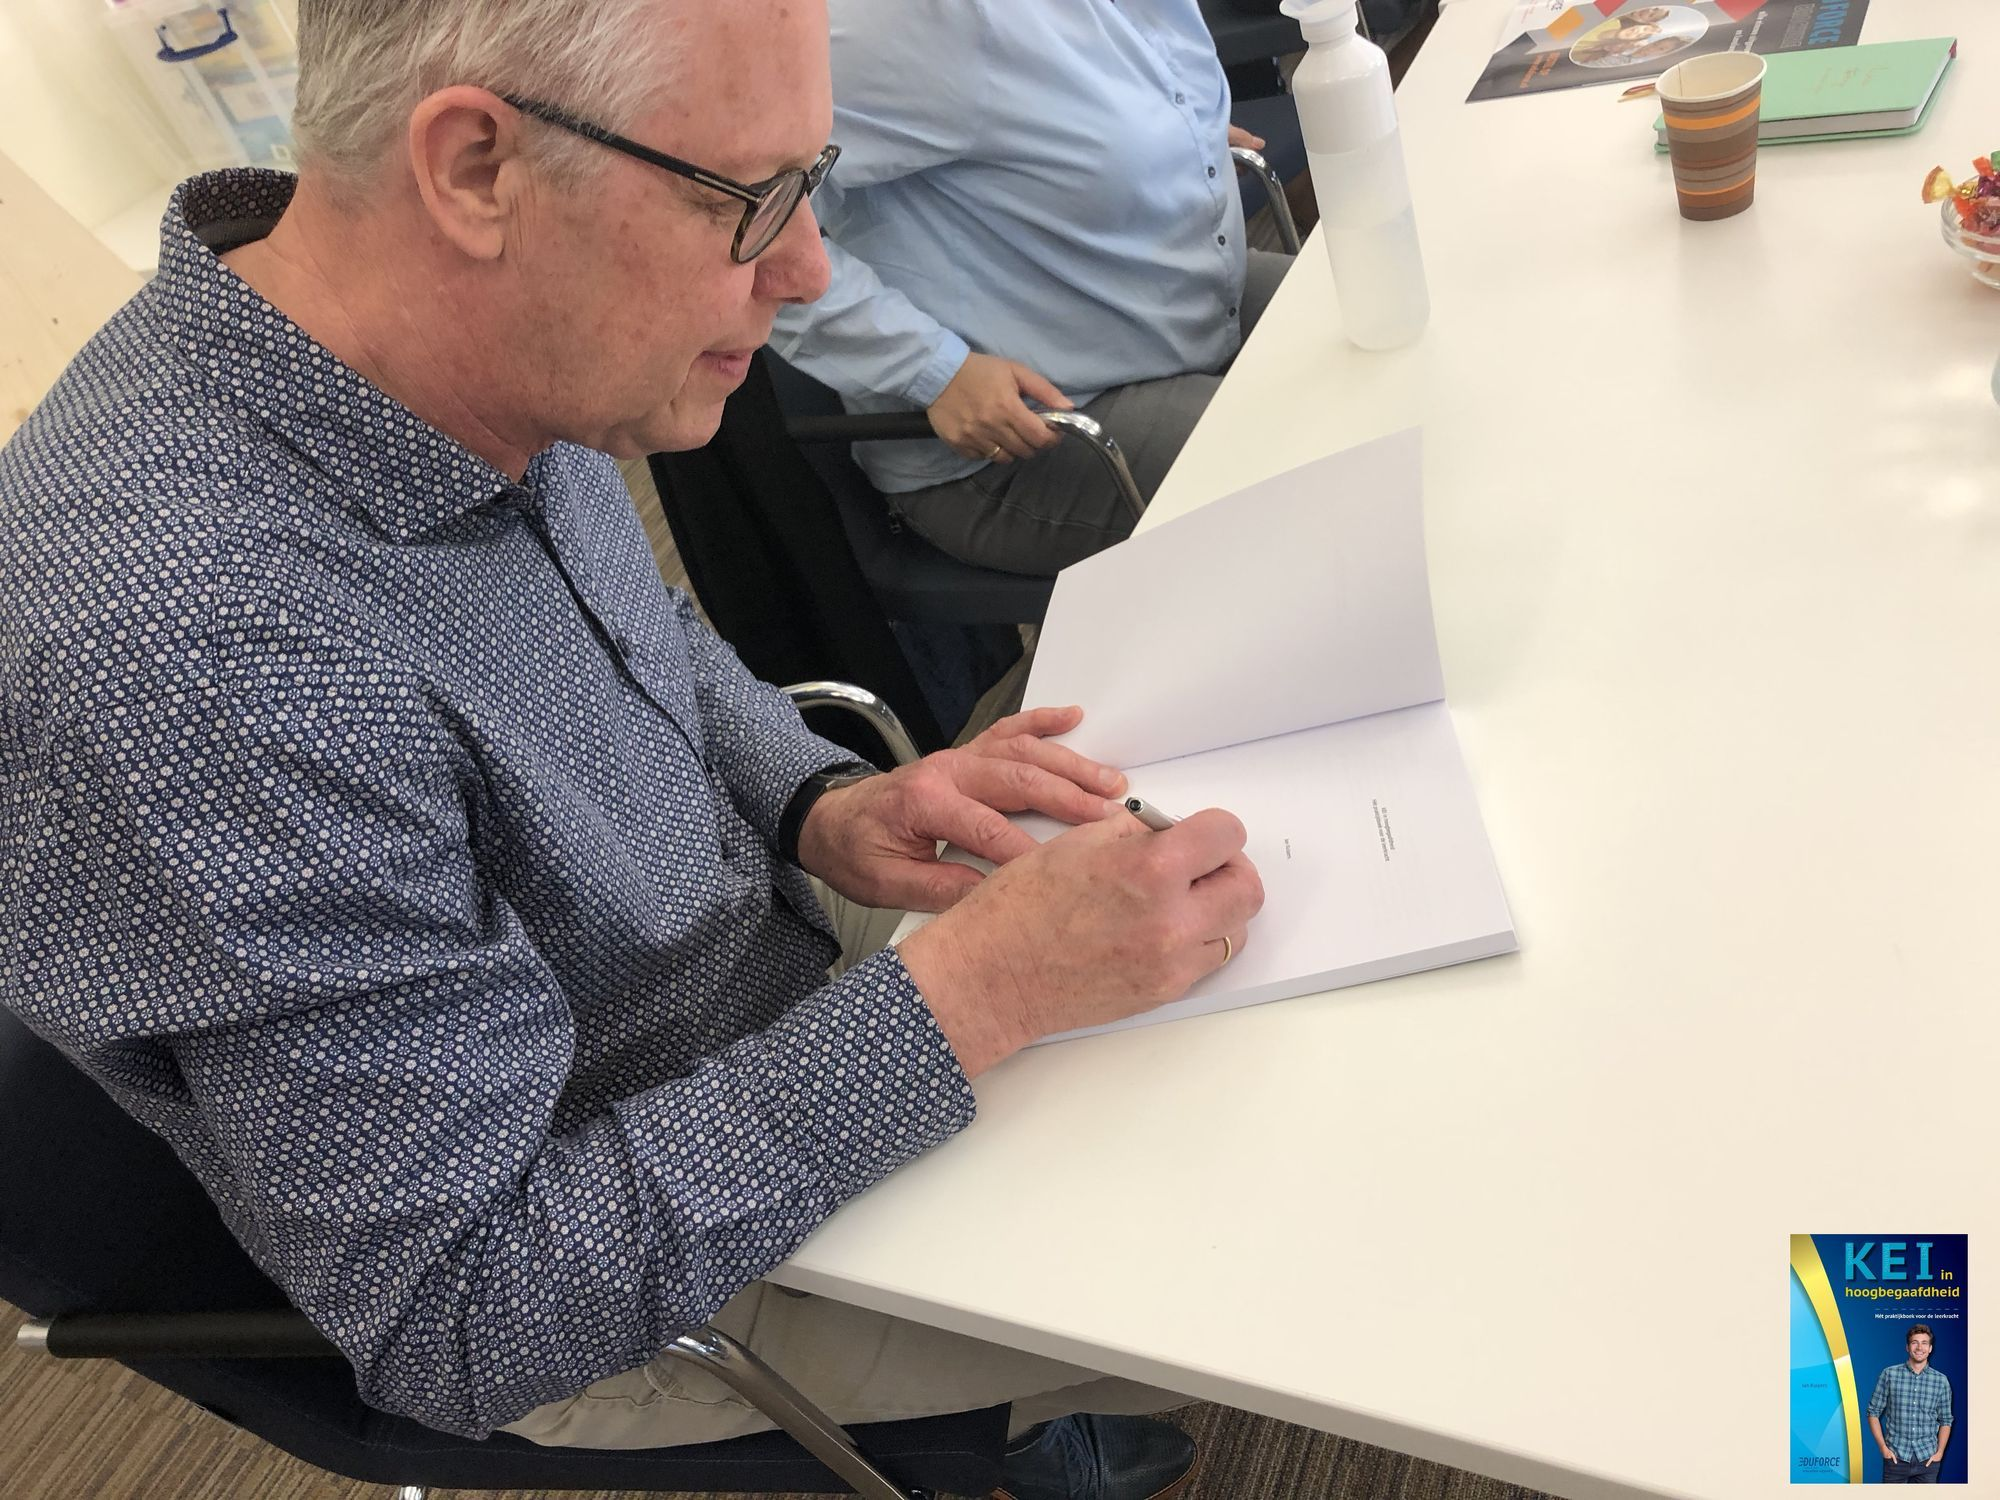 Recensie Kei in Hoogbegaafdheid van Bertus Meijer, Onderwijsenzo